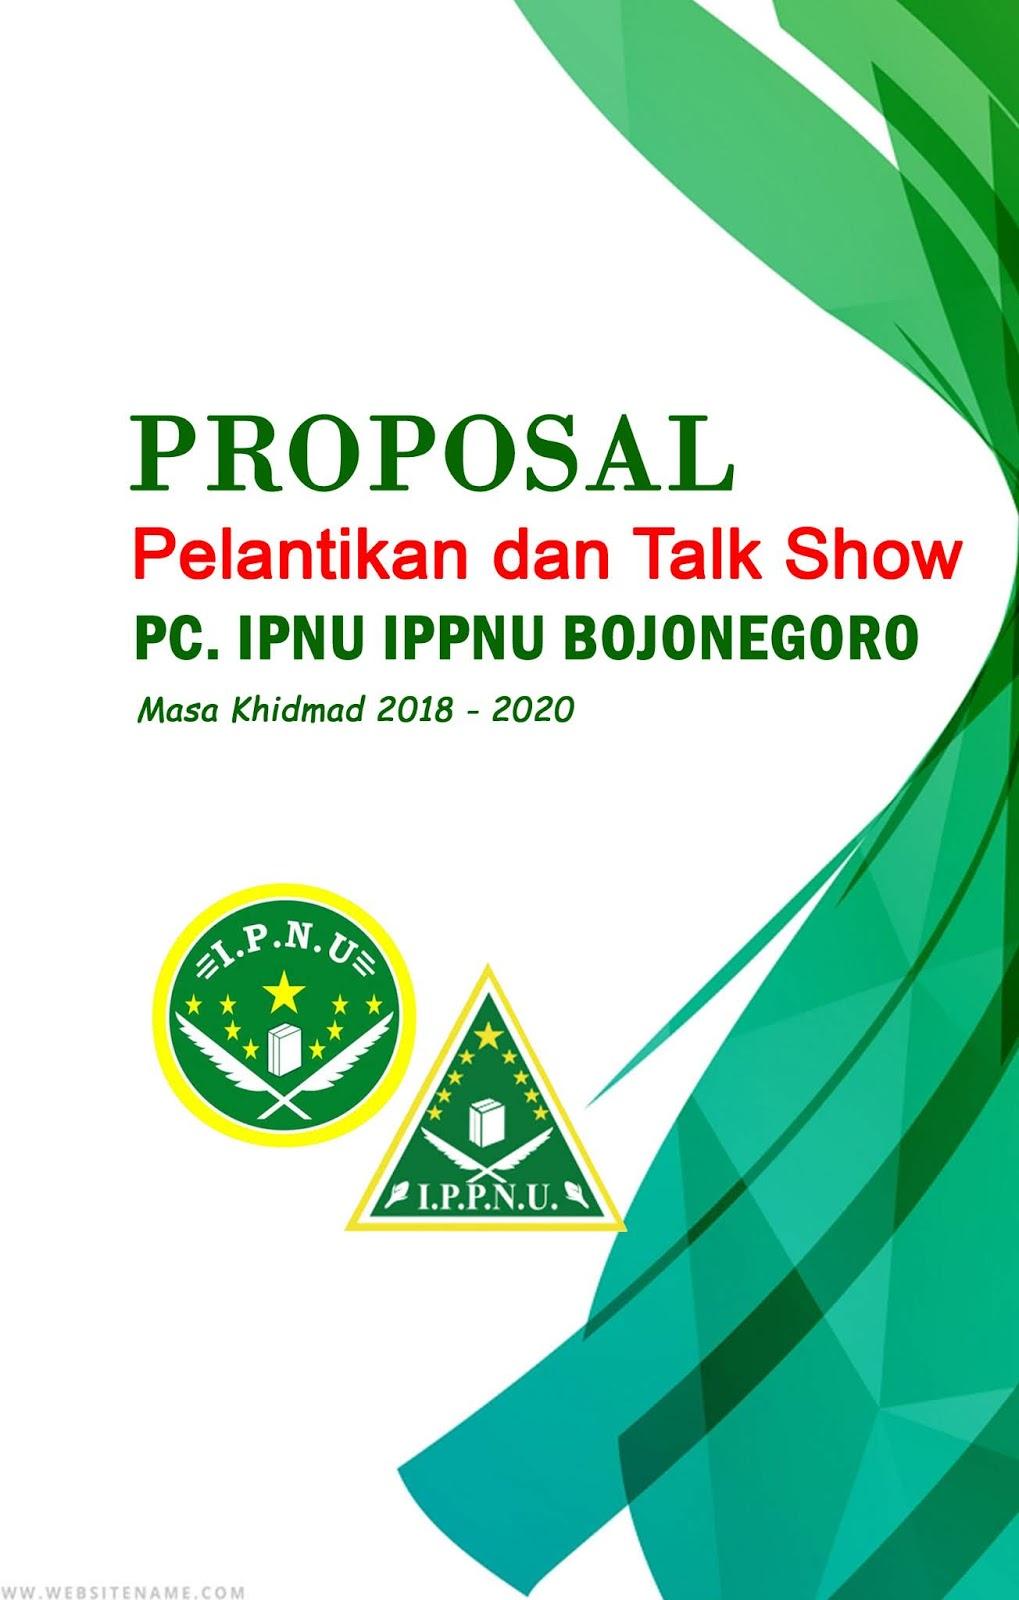 Contoh Proposal Pelantikan Dan Talkshow Ukhti Erlita